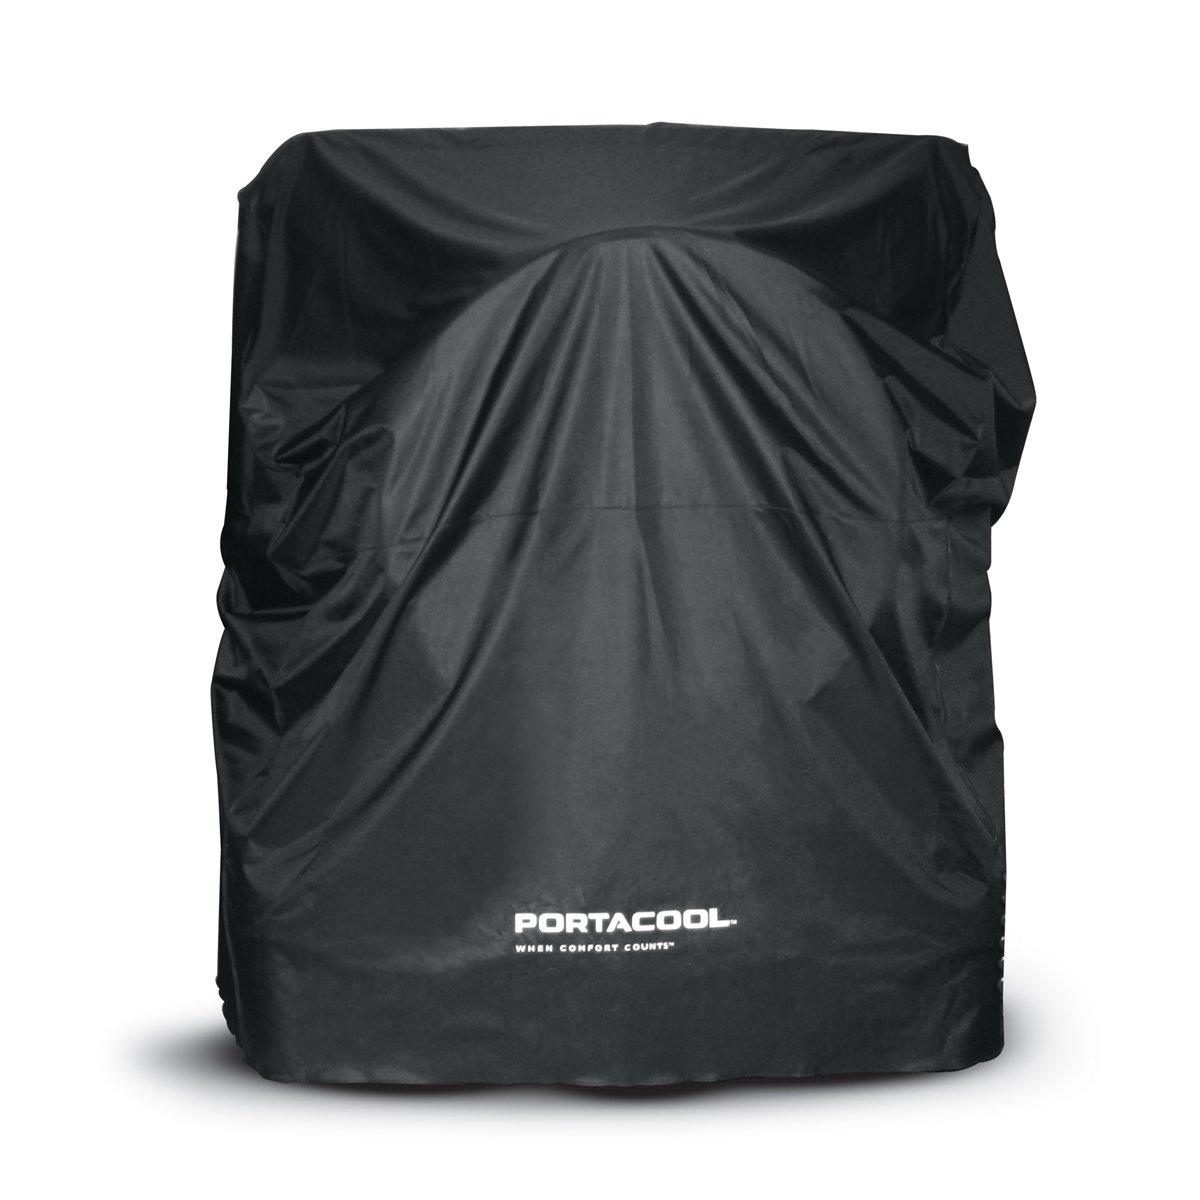 Portacool PARCVRJ27000 Replacement Protective Cover for Jetstream 270 Portable Evaporative Cooler